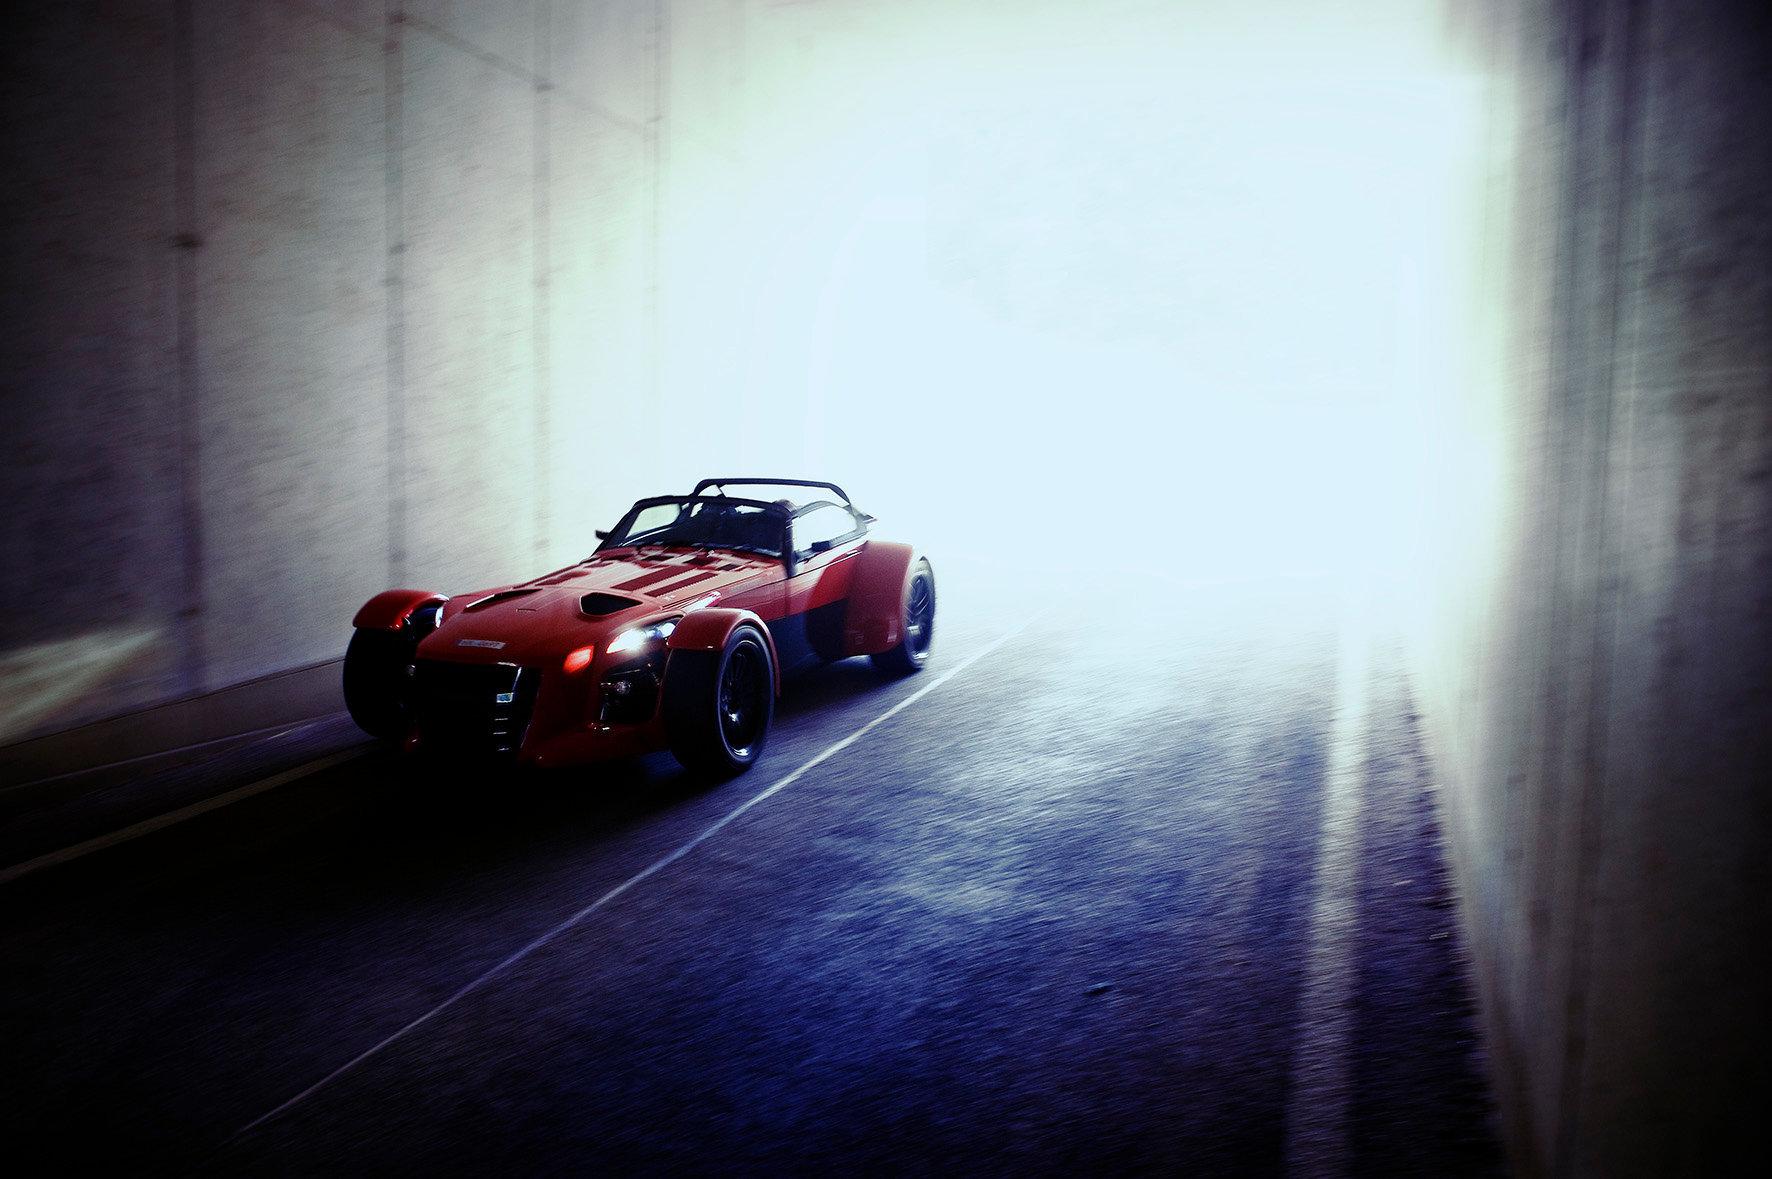 Donkervoort GTO Bilsterberg